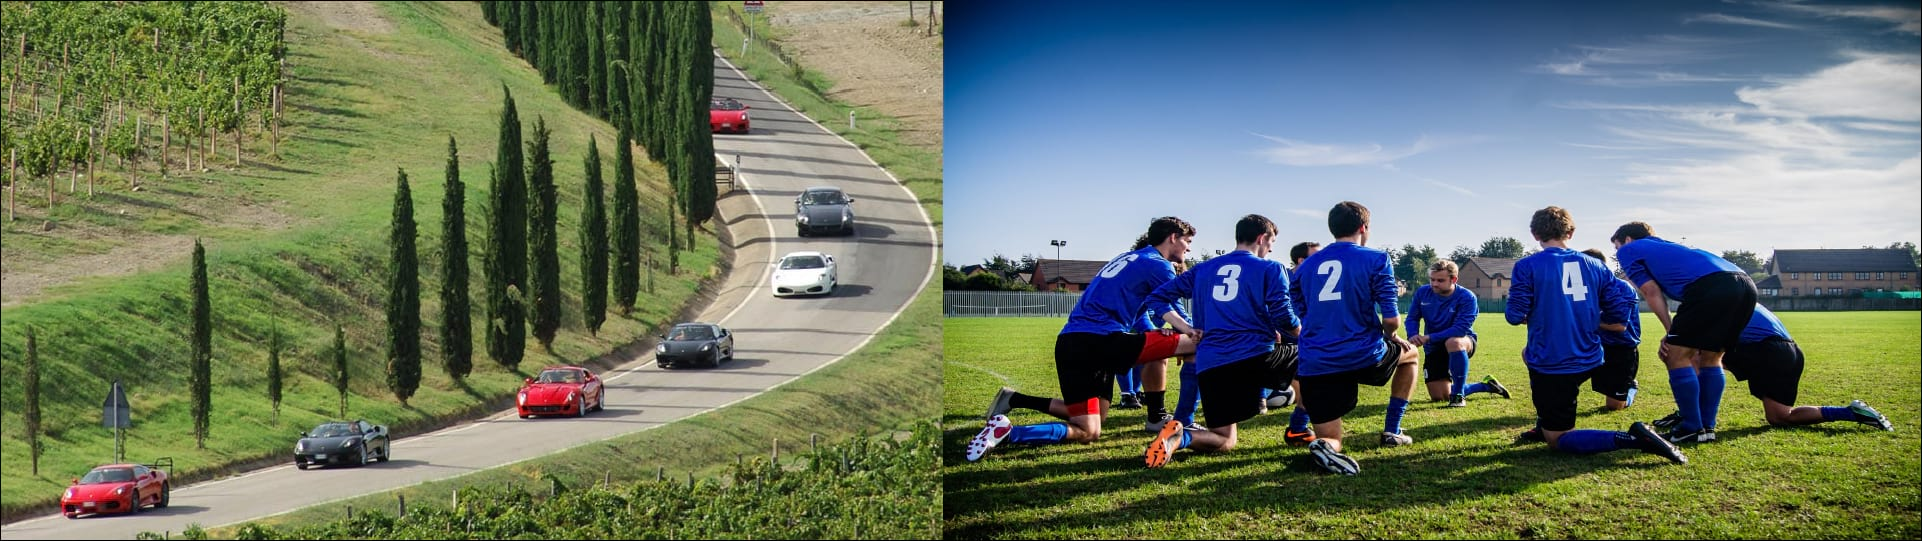 Sports cars racing image, Soccer team huddle image